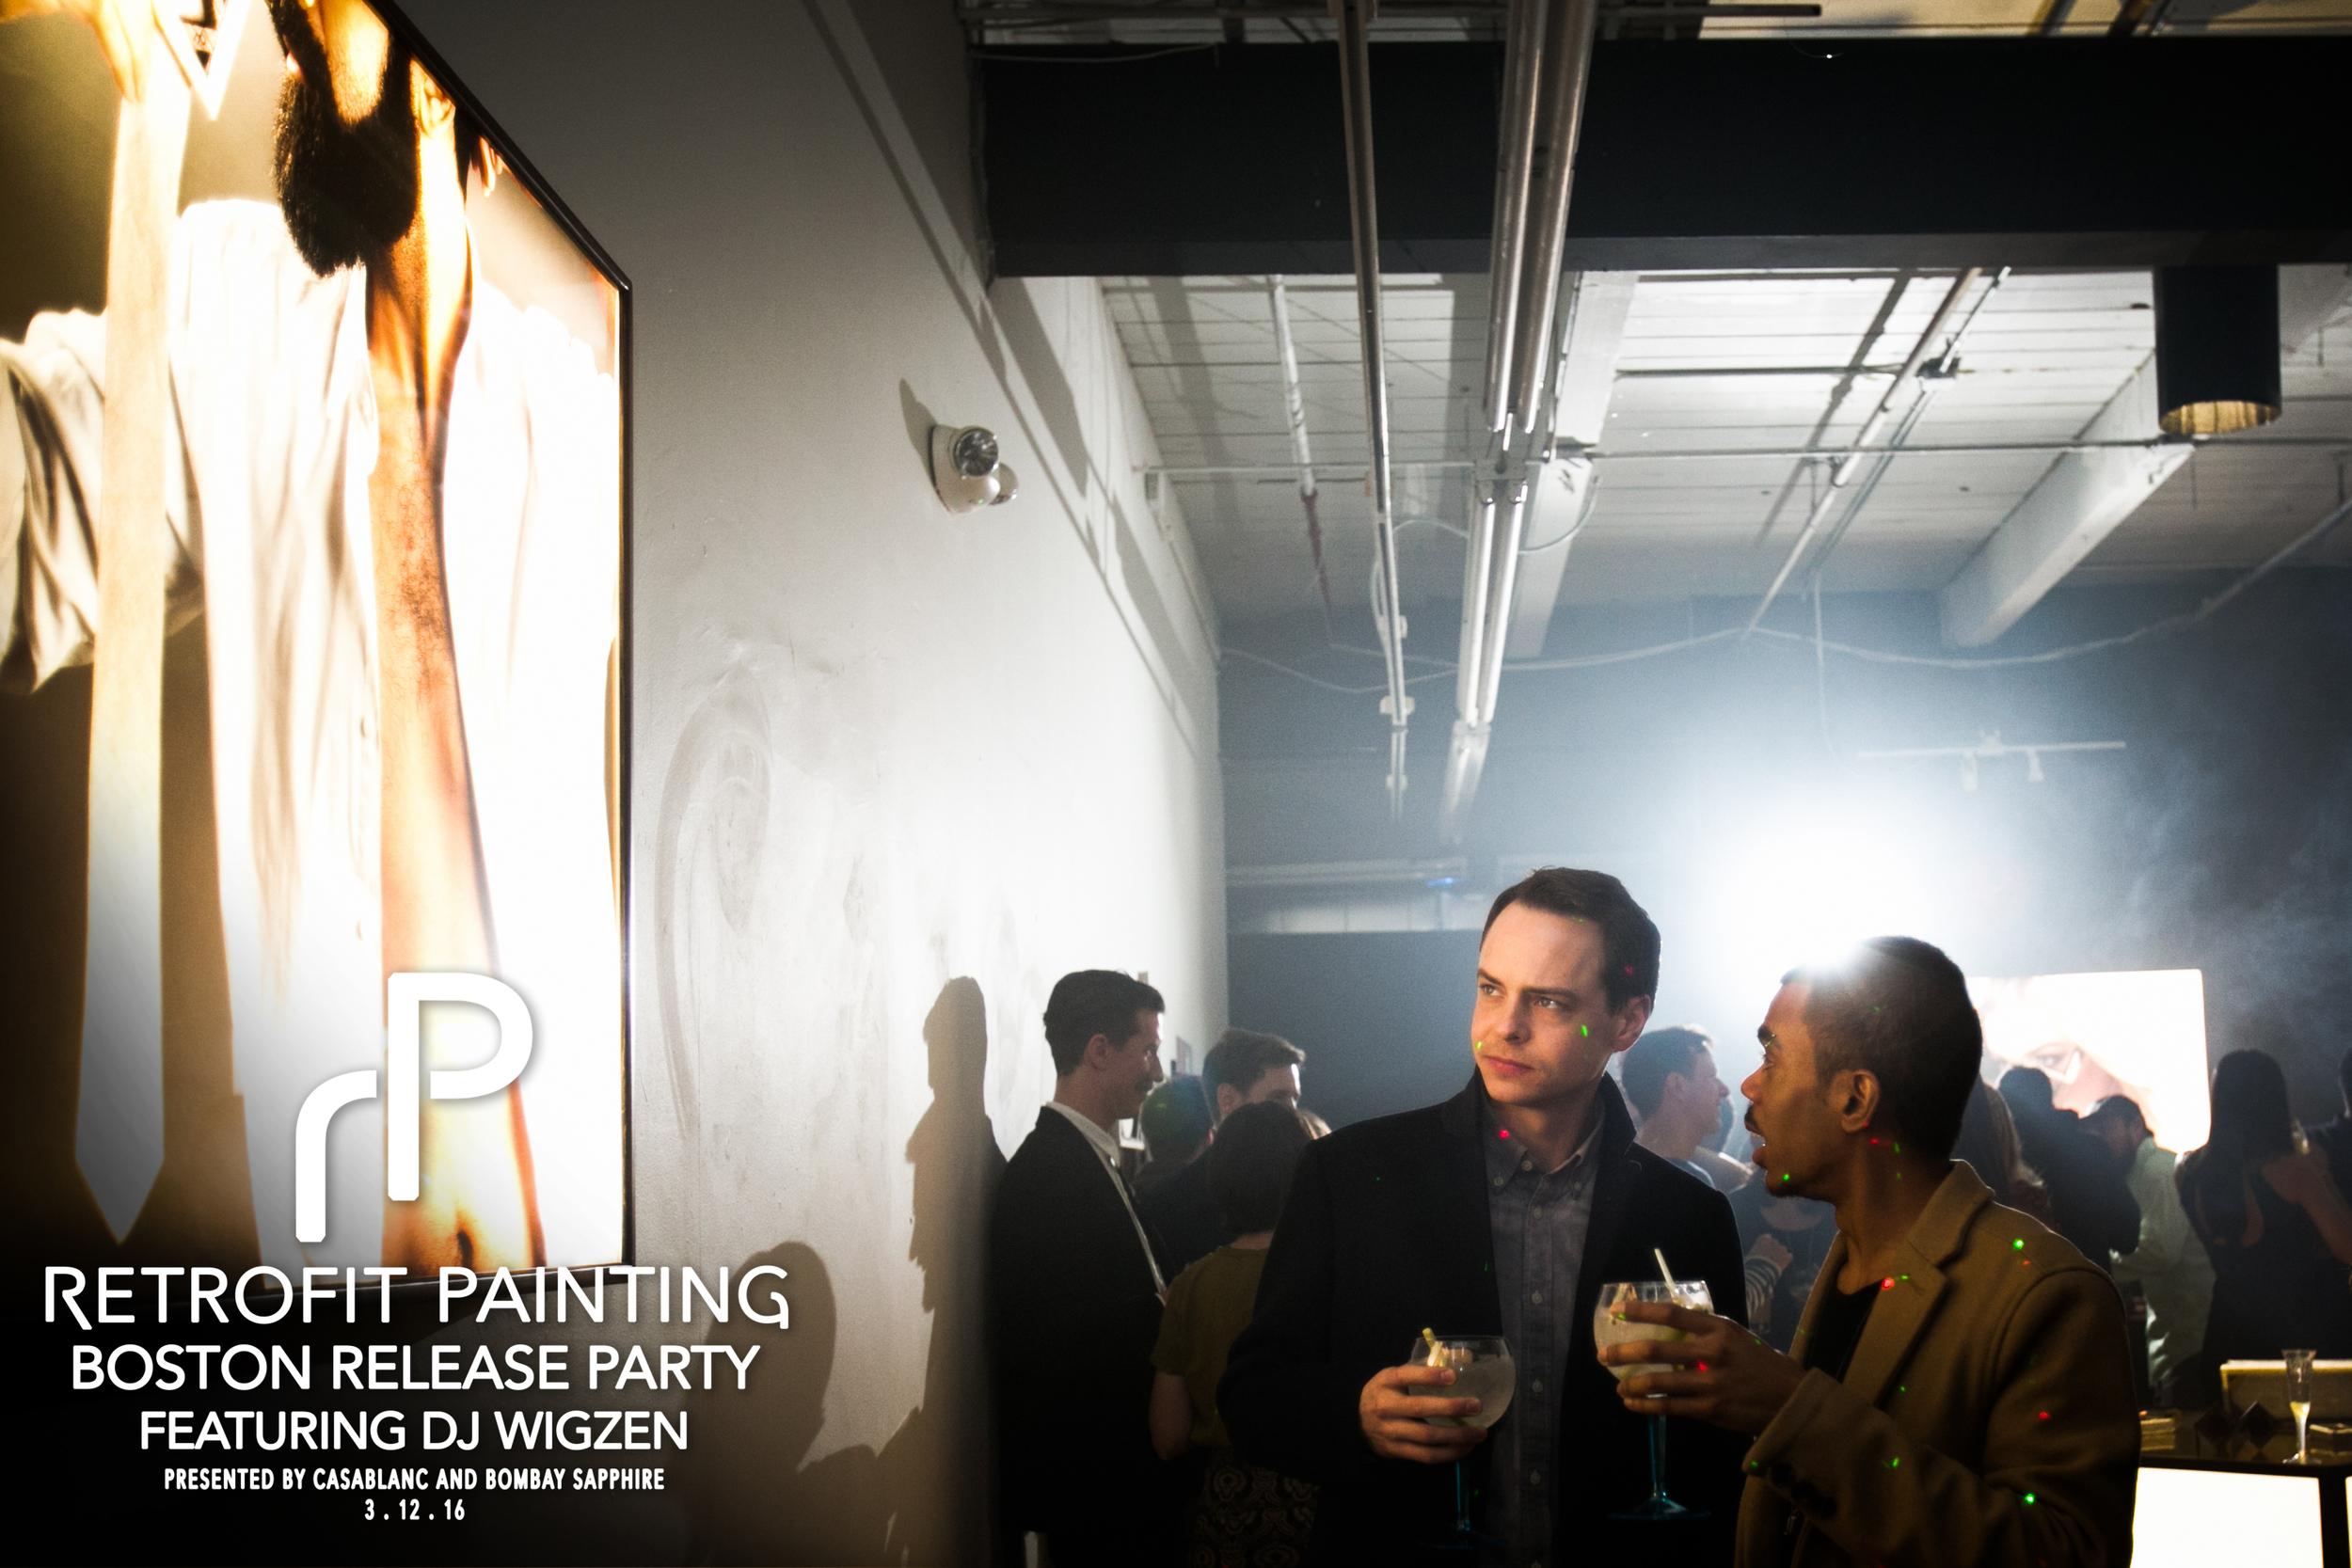 Retrofit Painting Boston Release Party 0172.jpg